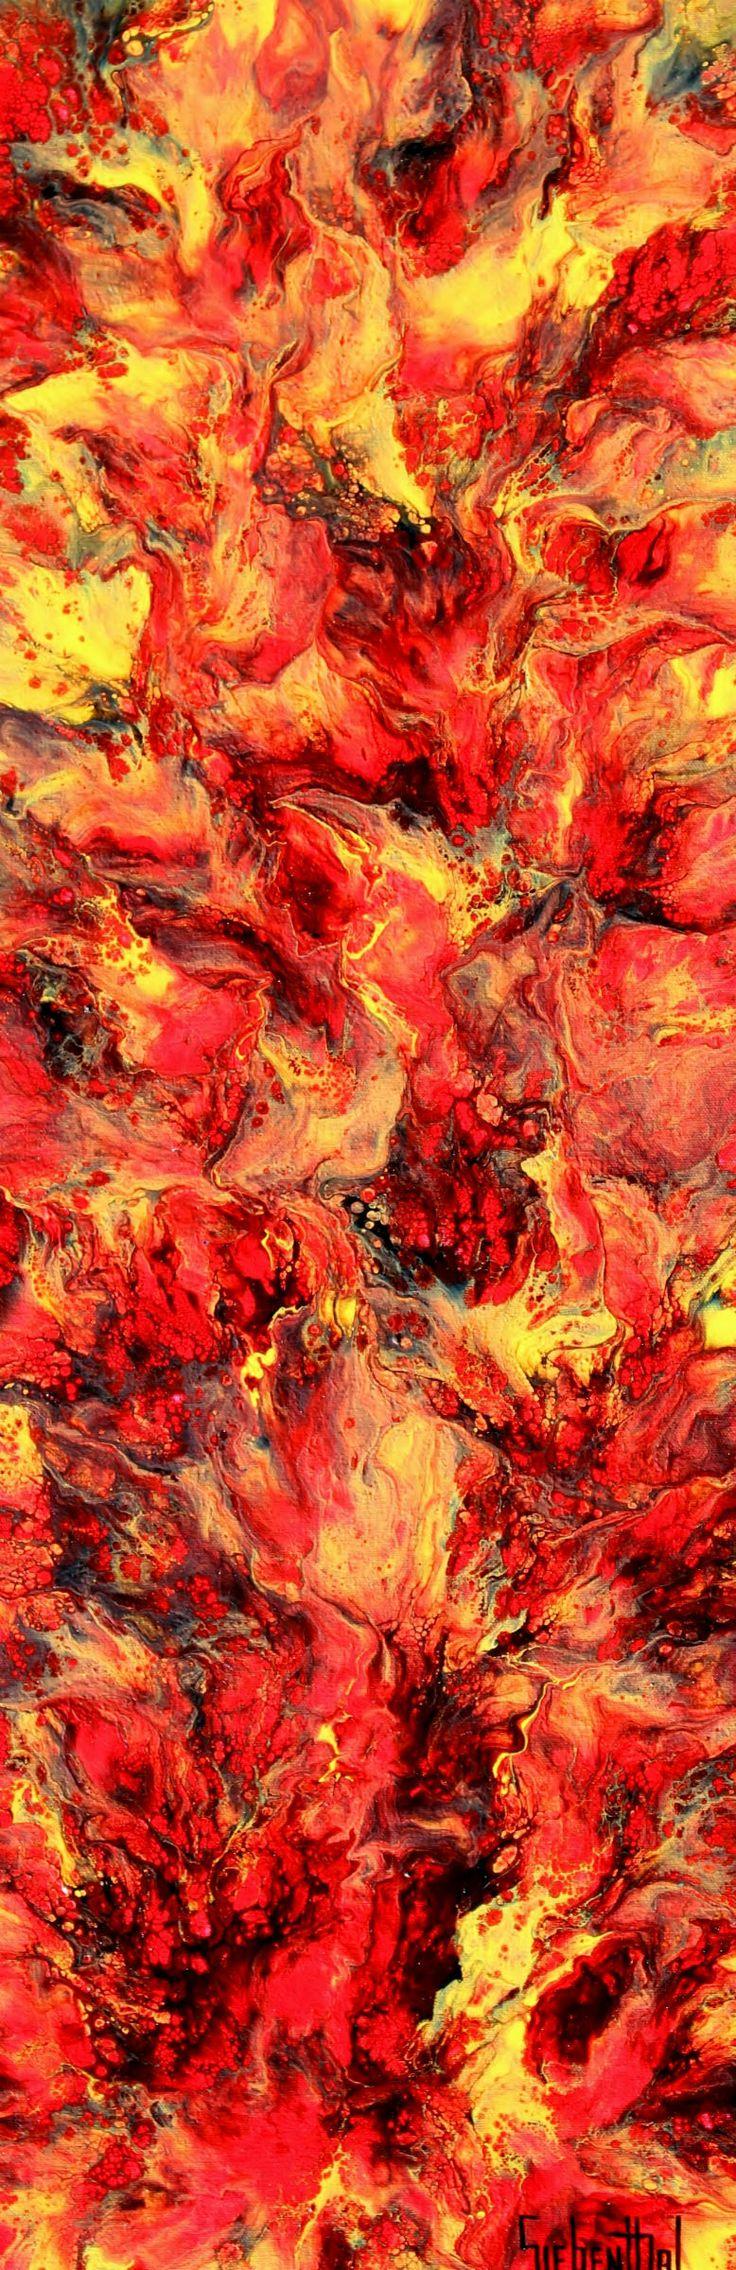 "Inferno by Eric Siebenthal | $250 | 12""w x 36""h | Original Art | http://www.vangoart.co/eric-siebenthal/inferno-daaeef89-c1b4-4cad-bcc7-3bcb31836f06 @VangoArt"